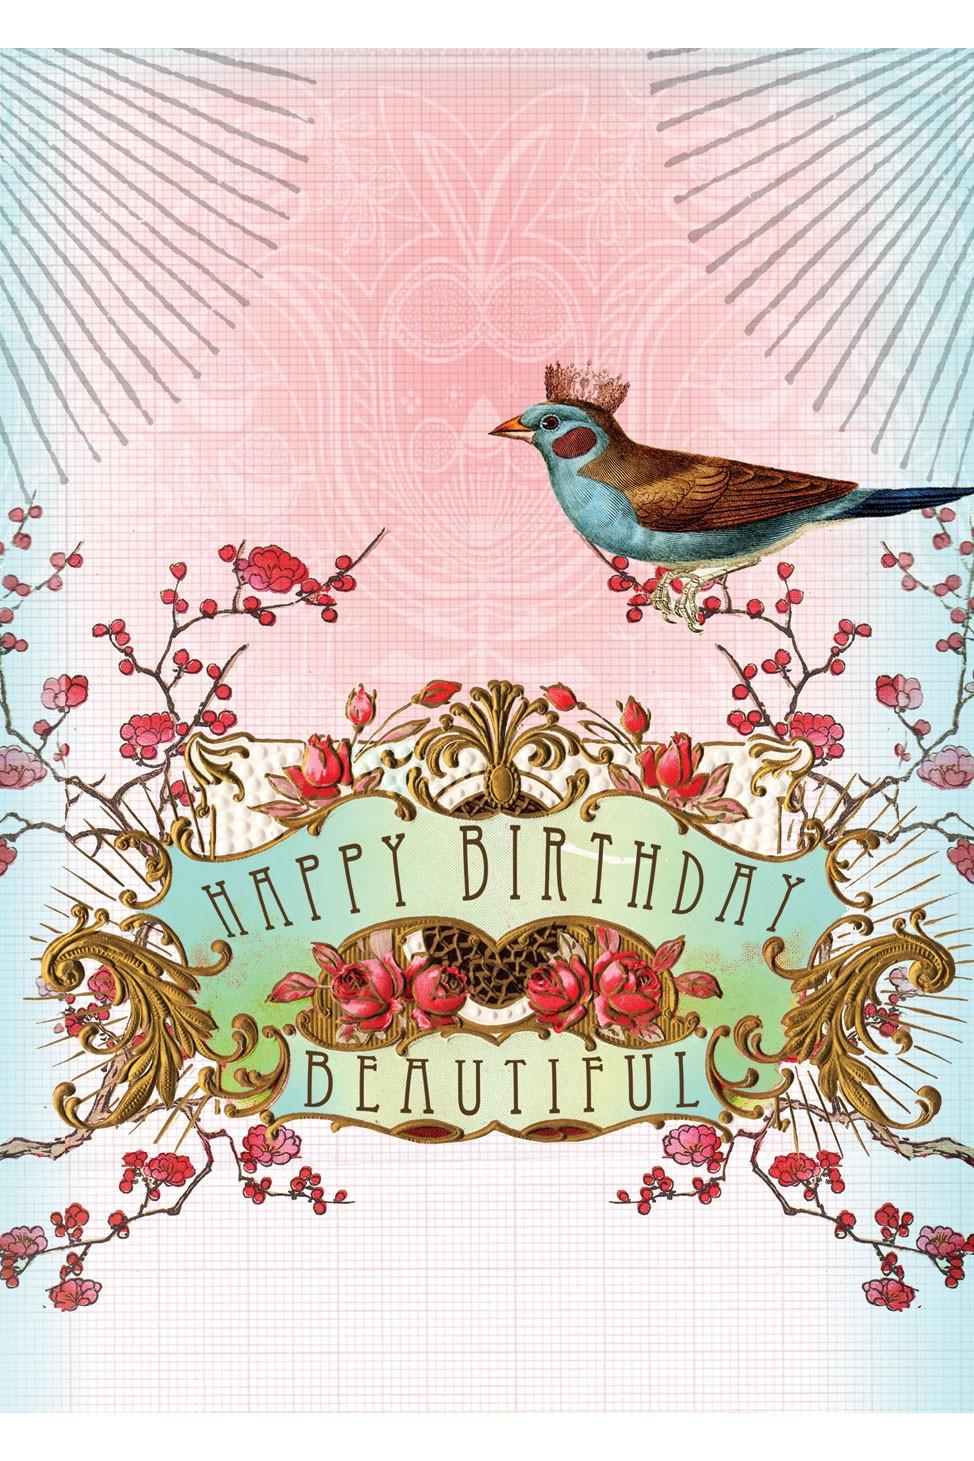 Happy Birthday Mom Quotes Wallpapers Papaya Art Greetings Cards